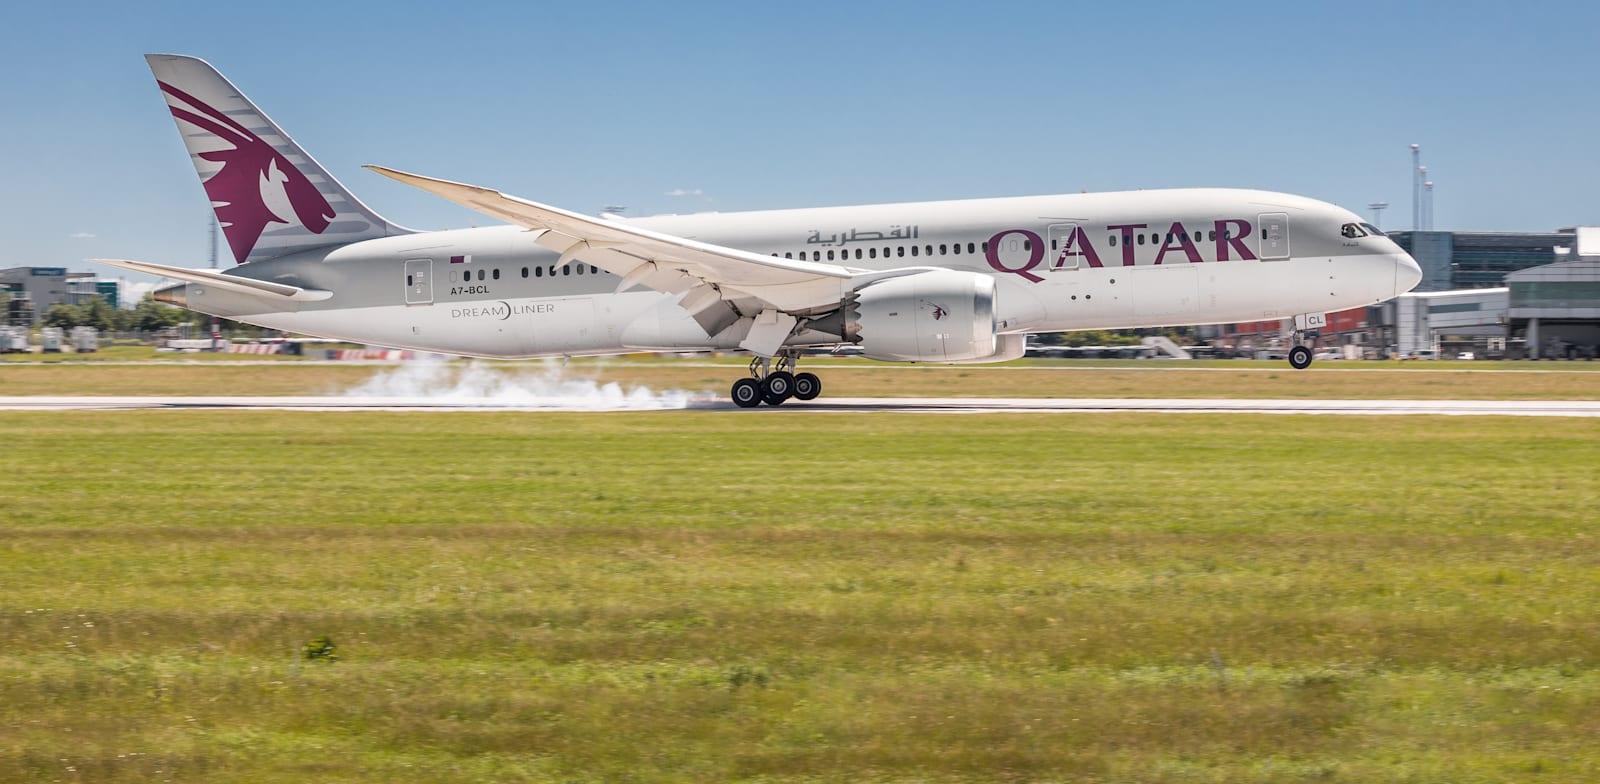 מטוס של של קאטר איירווייז / צילום: Shutterstock